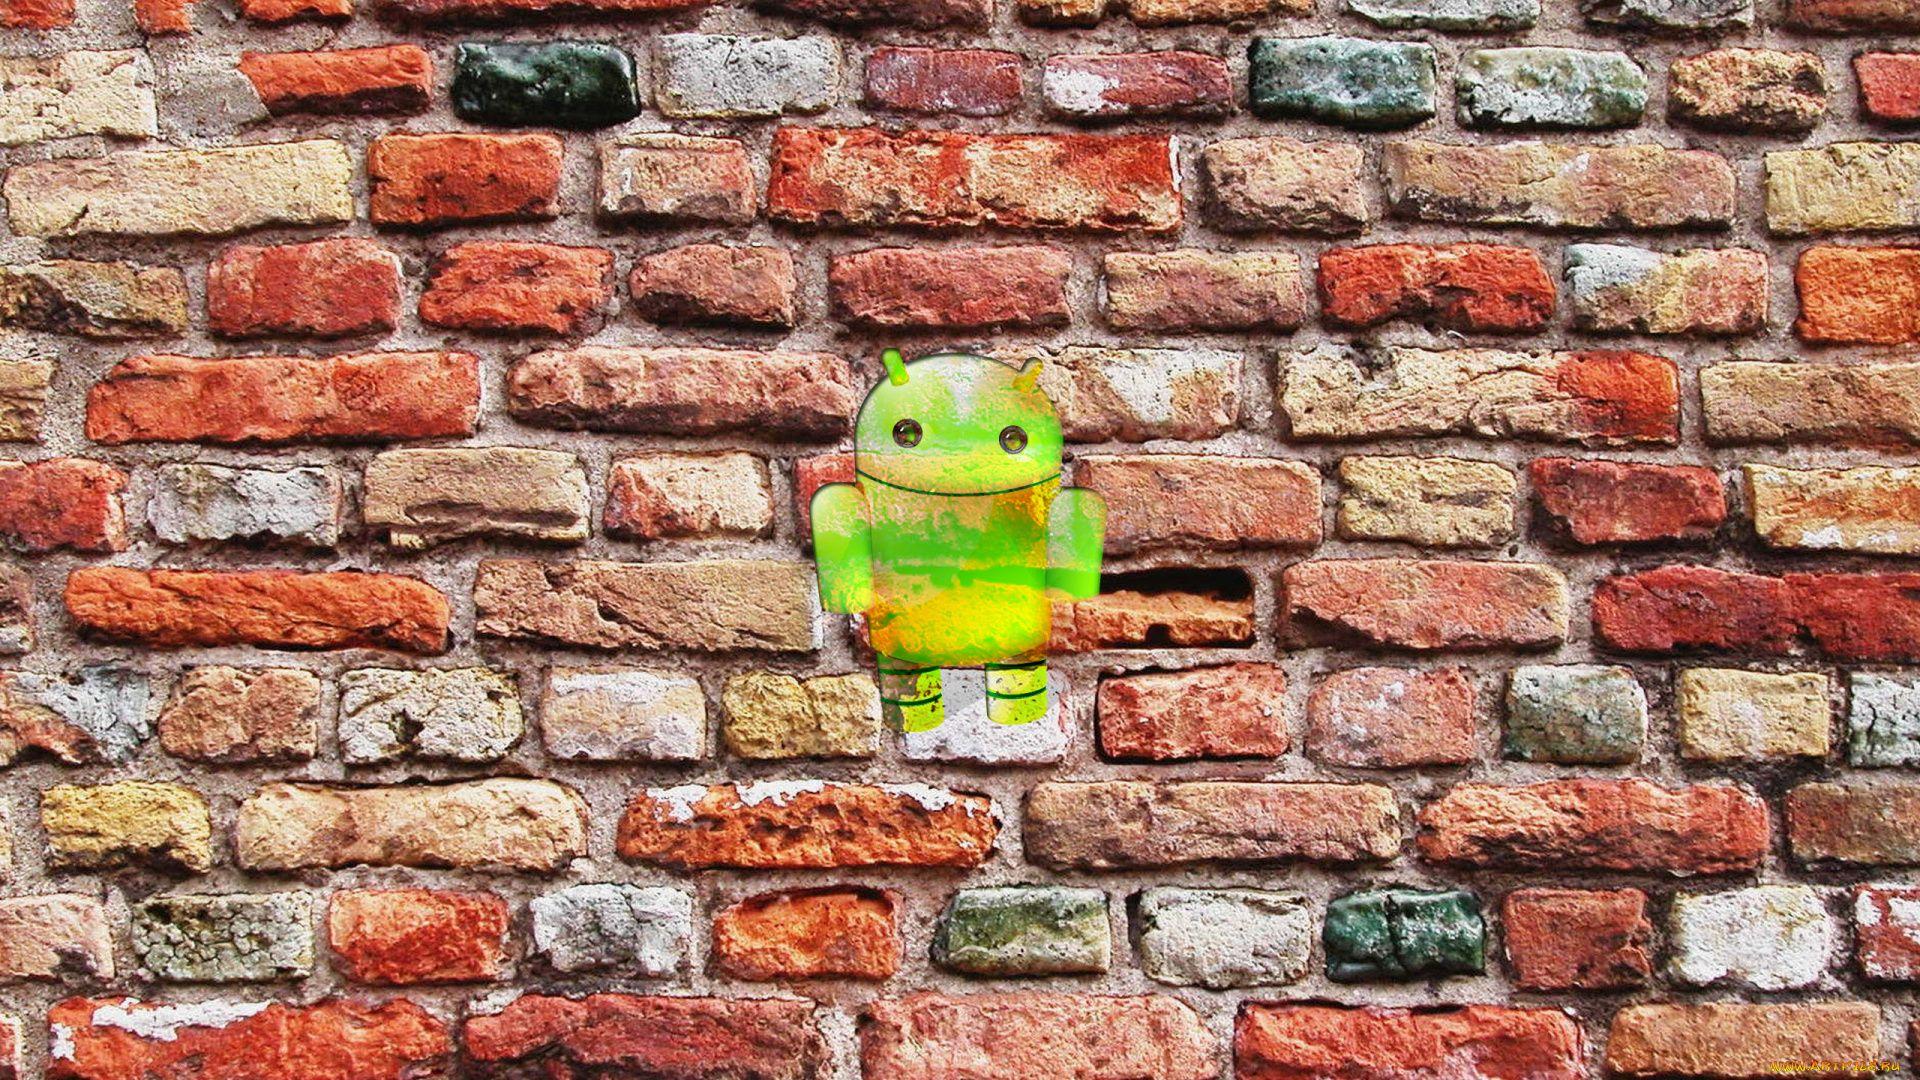 Brick Paper Backdrop download wallpaper image